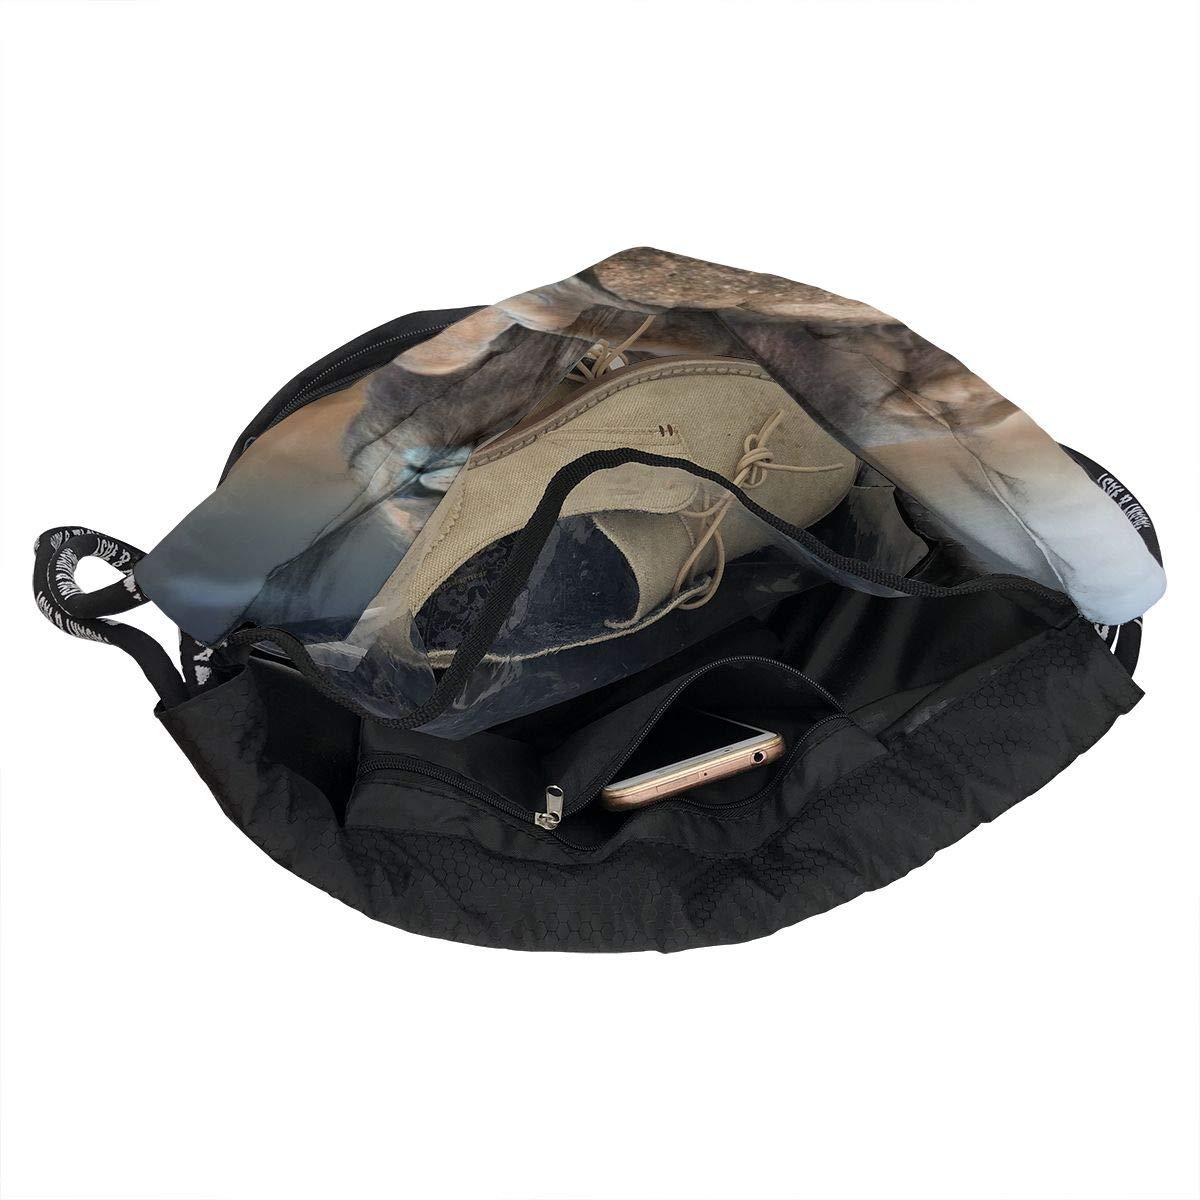 Portable Bundle Backpack Beautiful White Tigers Illustration Drawstring Bag For Girls /& Boys Gym Yoga Runner Sports Daypack